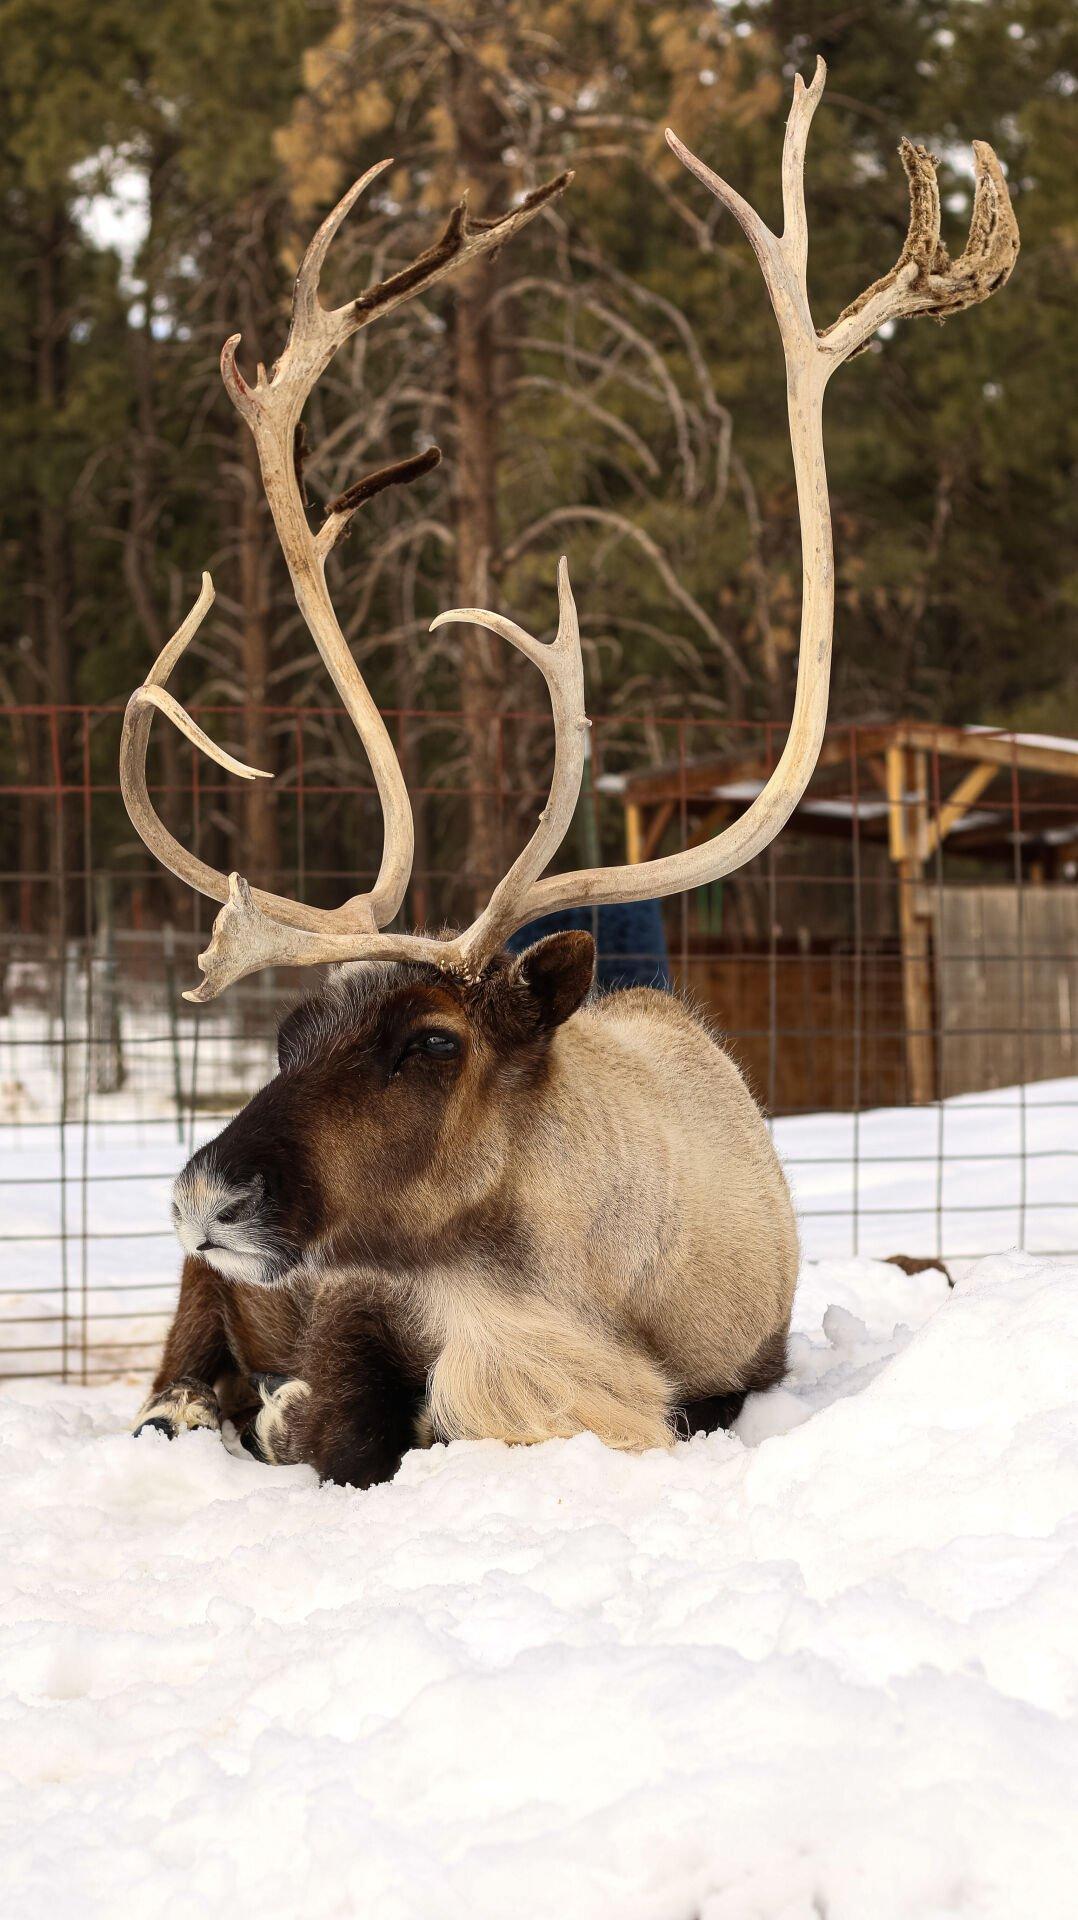 Grand Canyon Deer Farm provides interactive entertainment